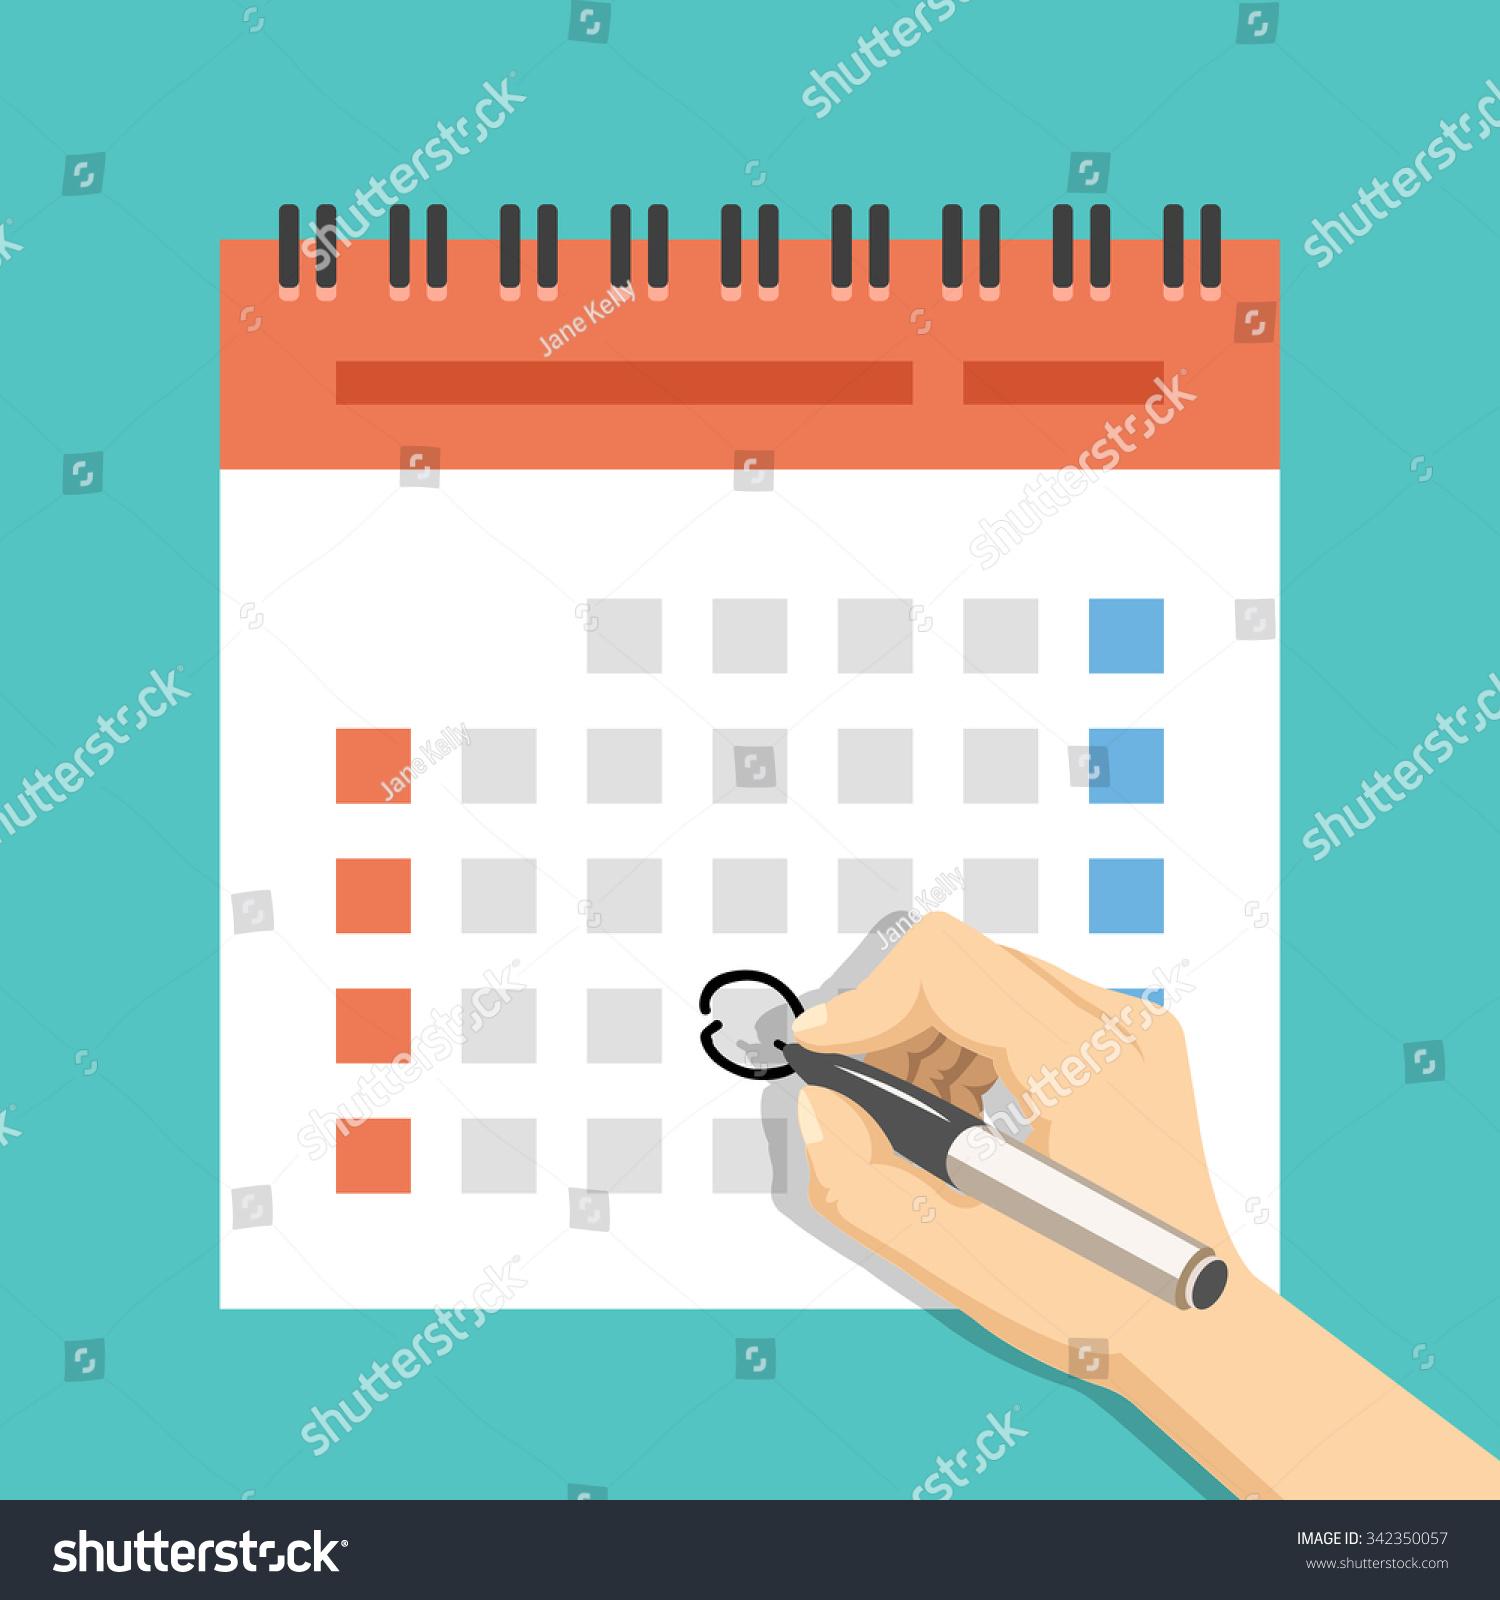 Event Calendar Illustration : Hand pen mark calendar us version stock vector